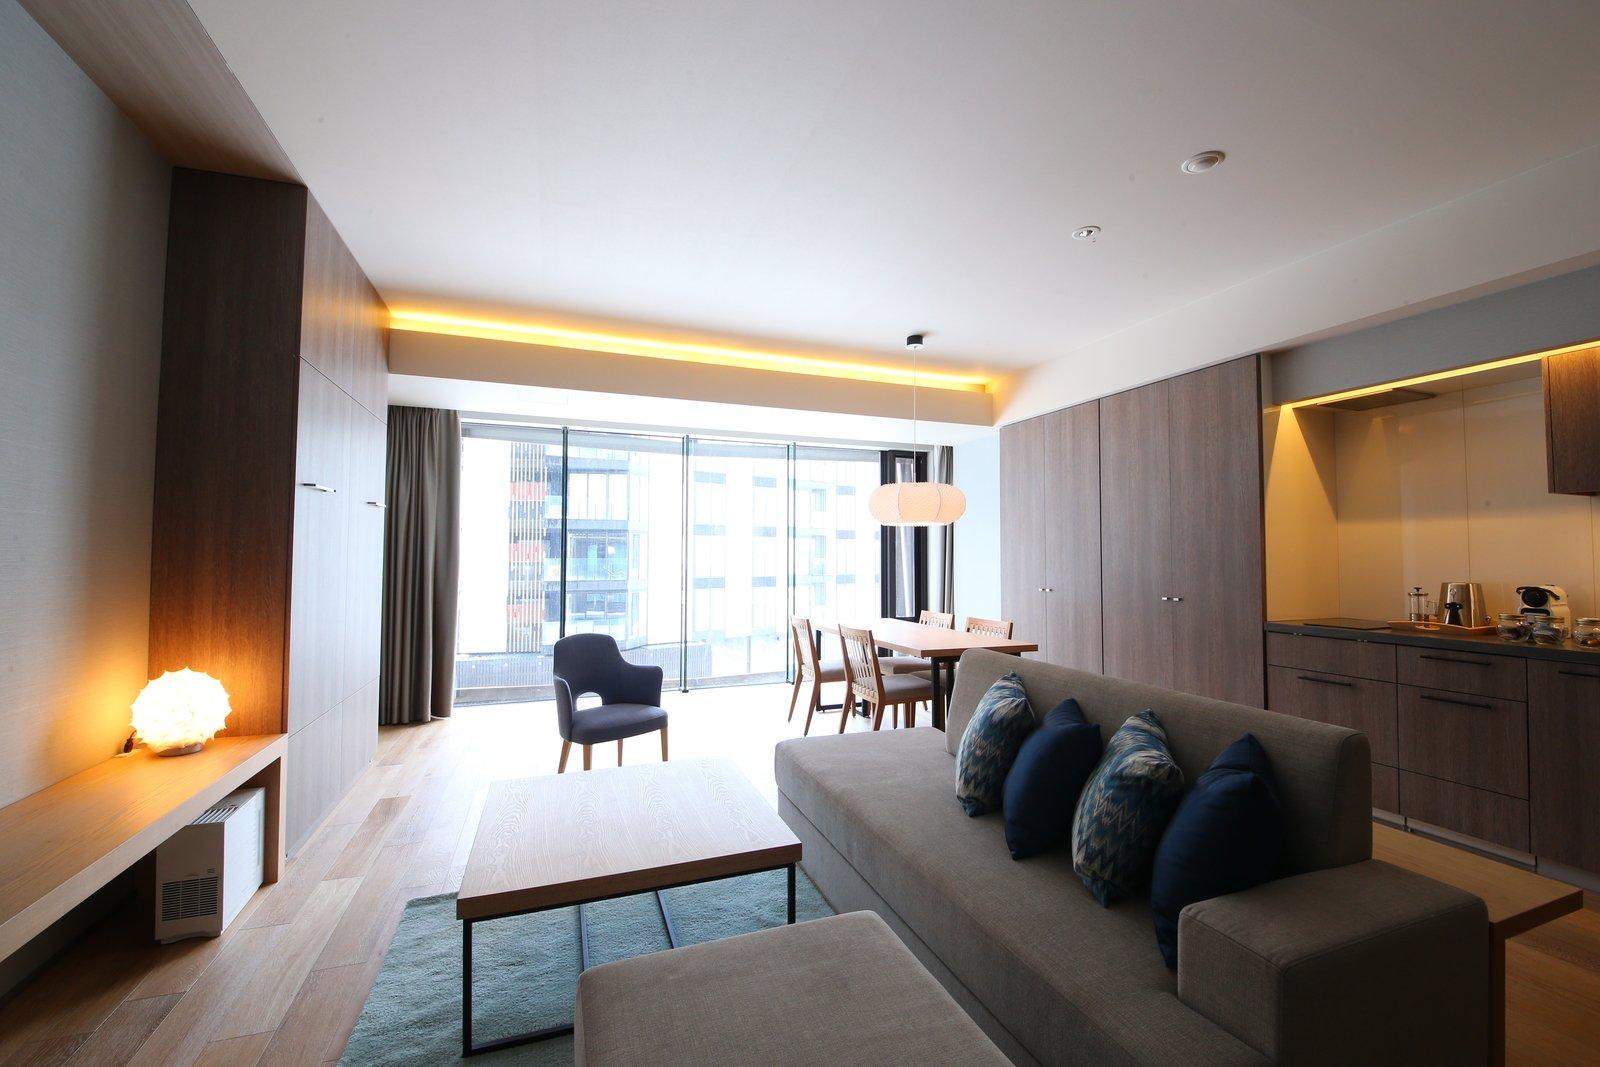 1 5 bedroom 1 large